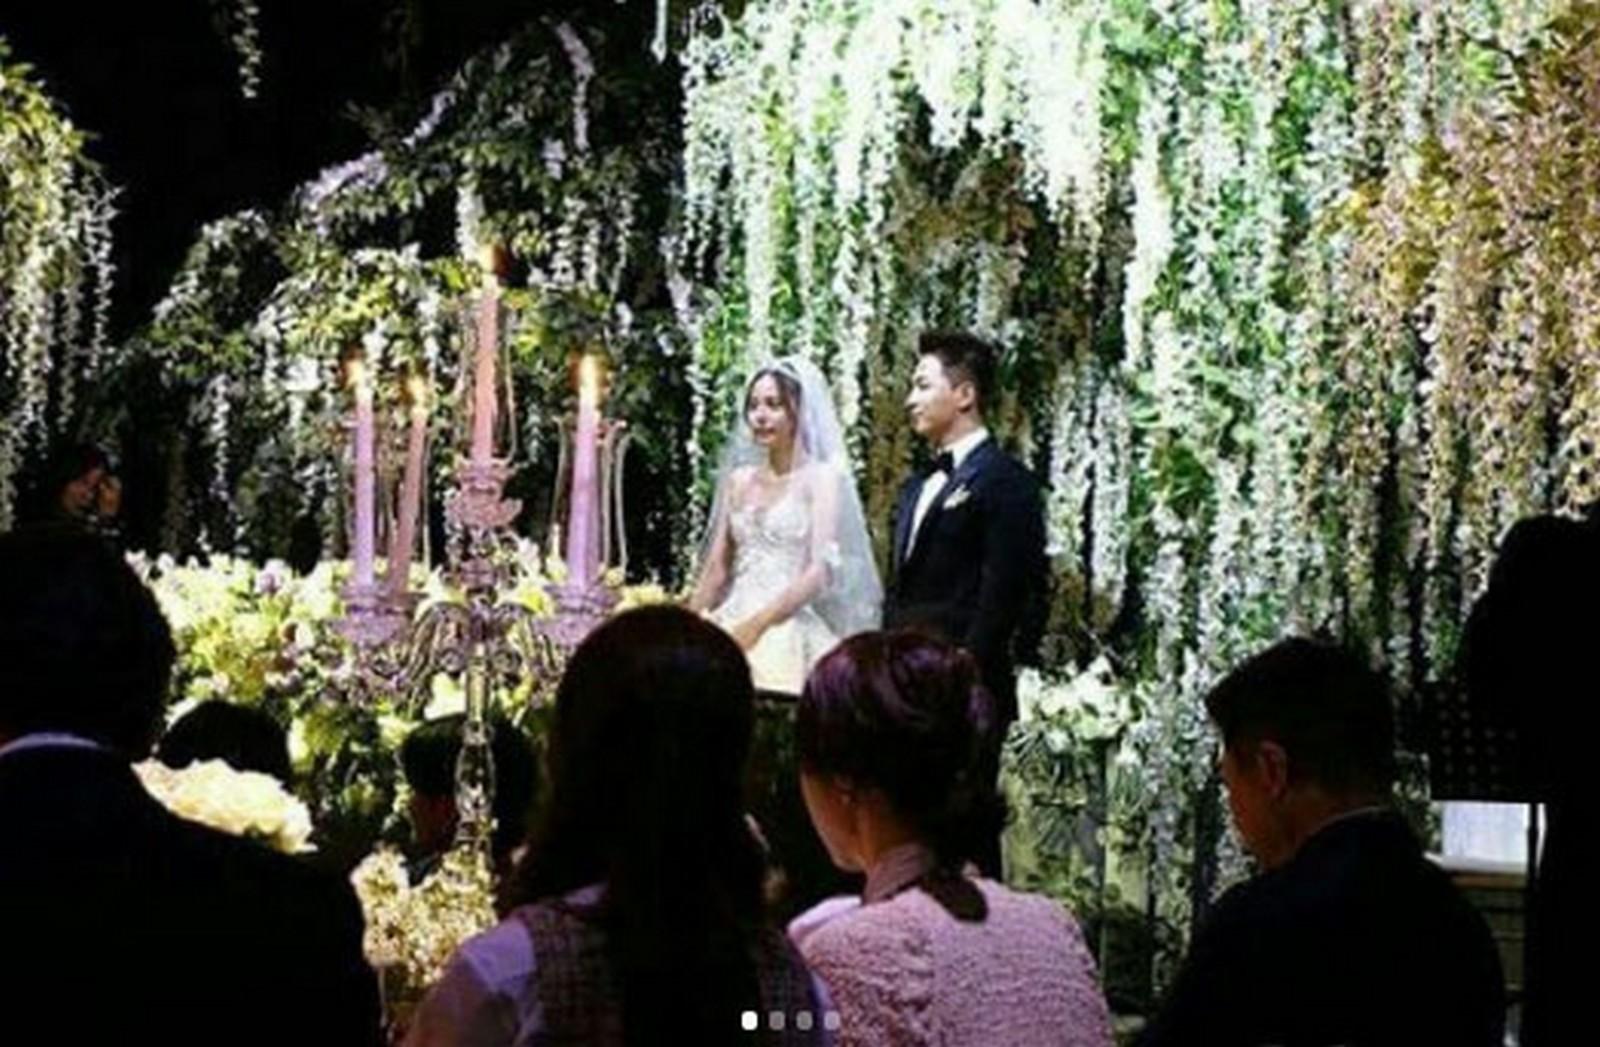 Hyo wedding min rin BIG BANG's